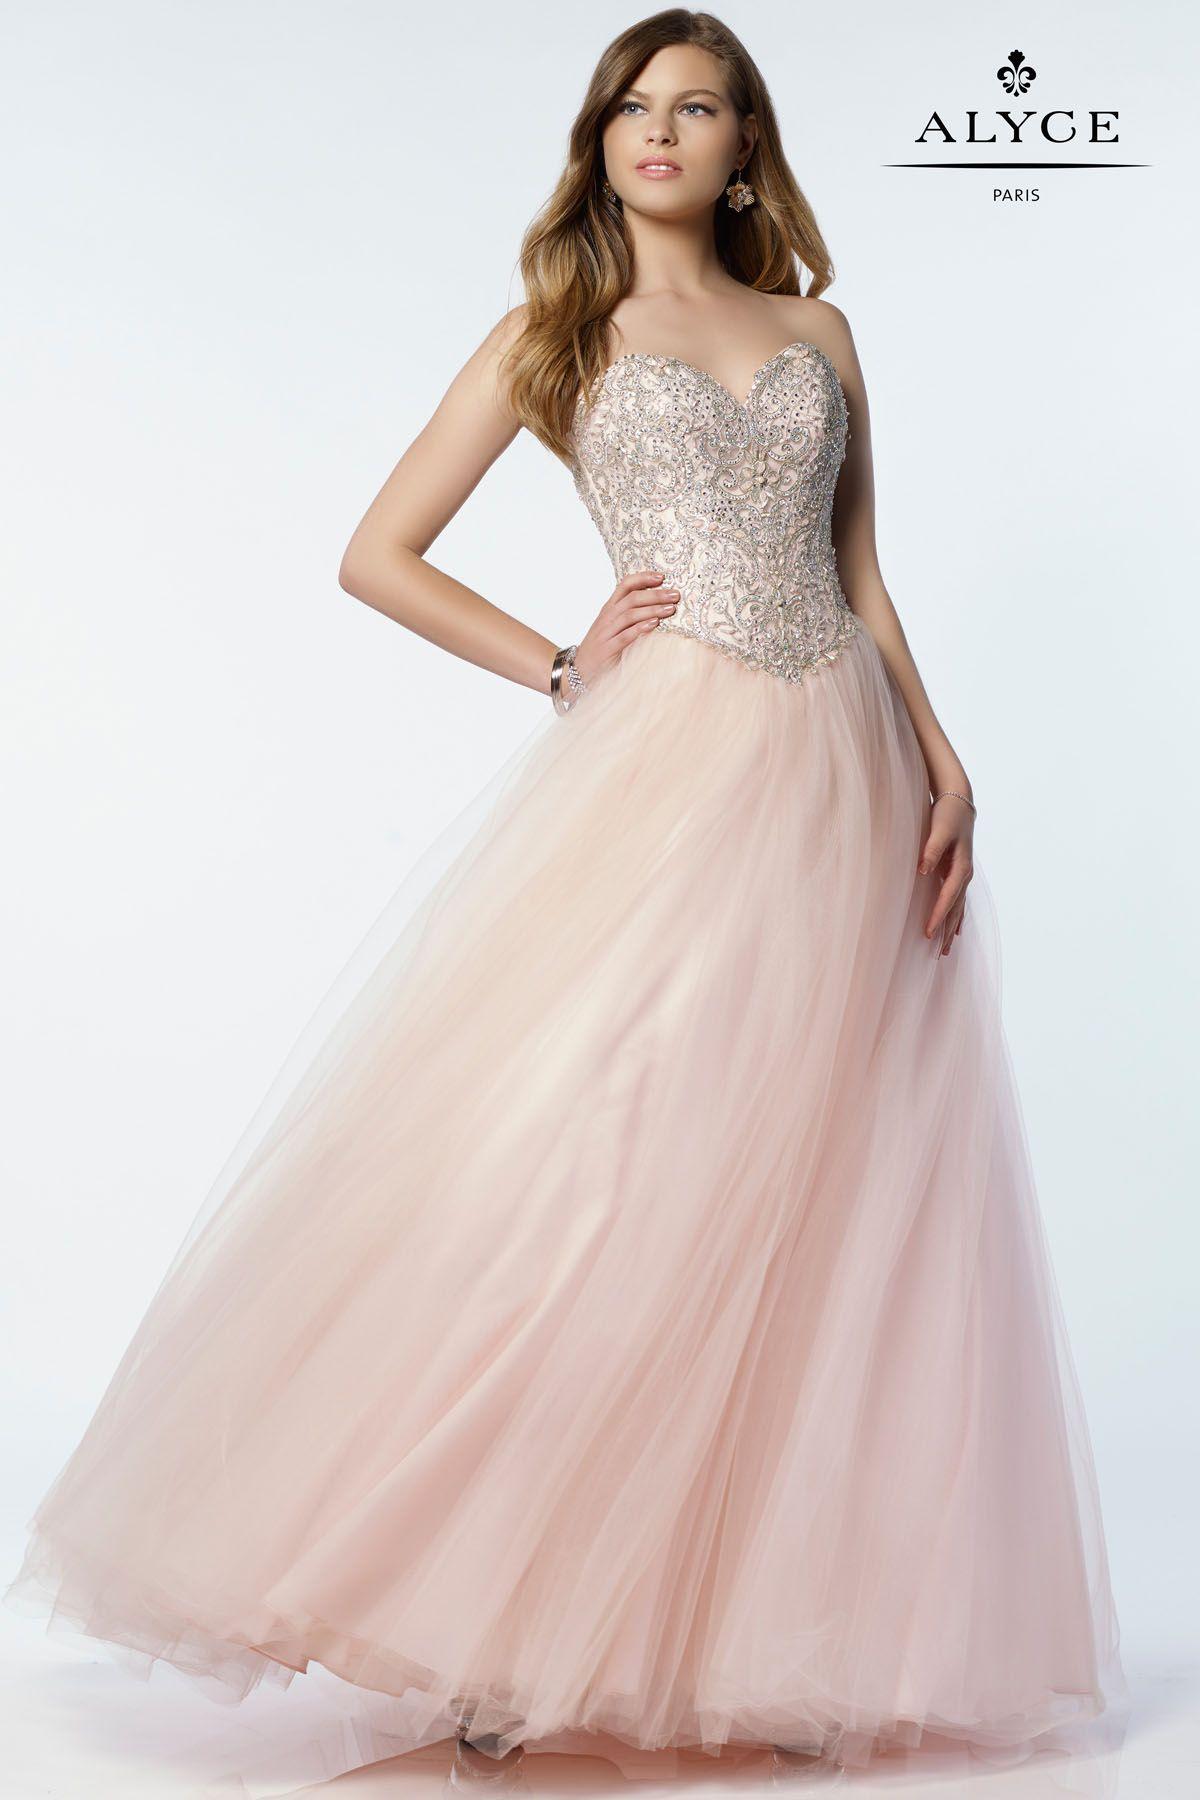 Alyce Paris 6724   Prom, Prom dress stores and Wedding dress